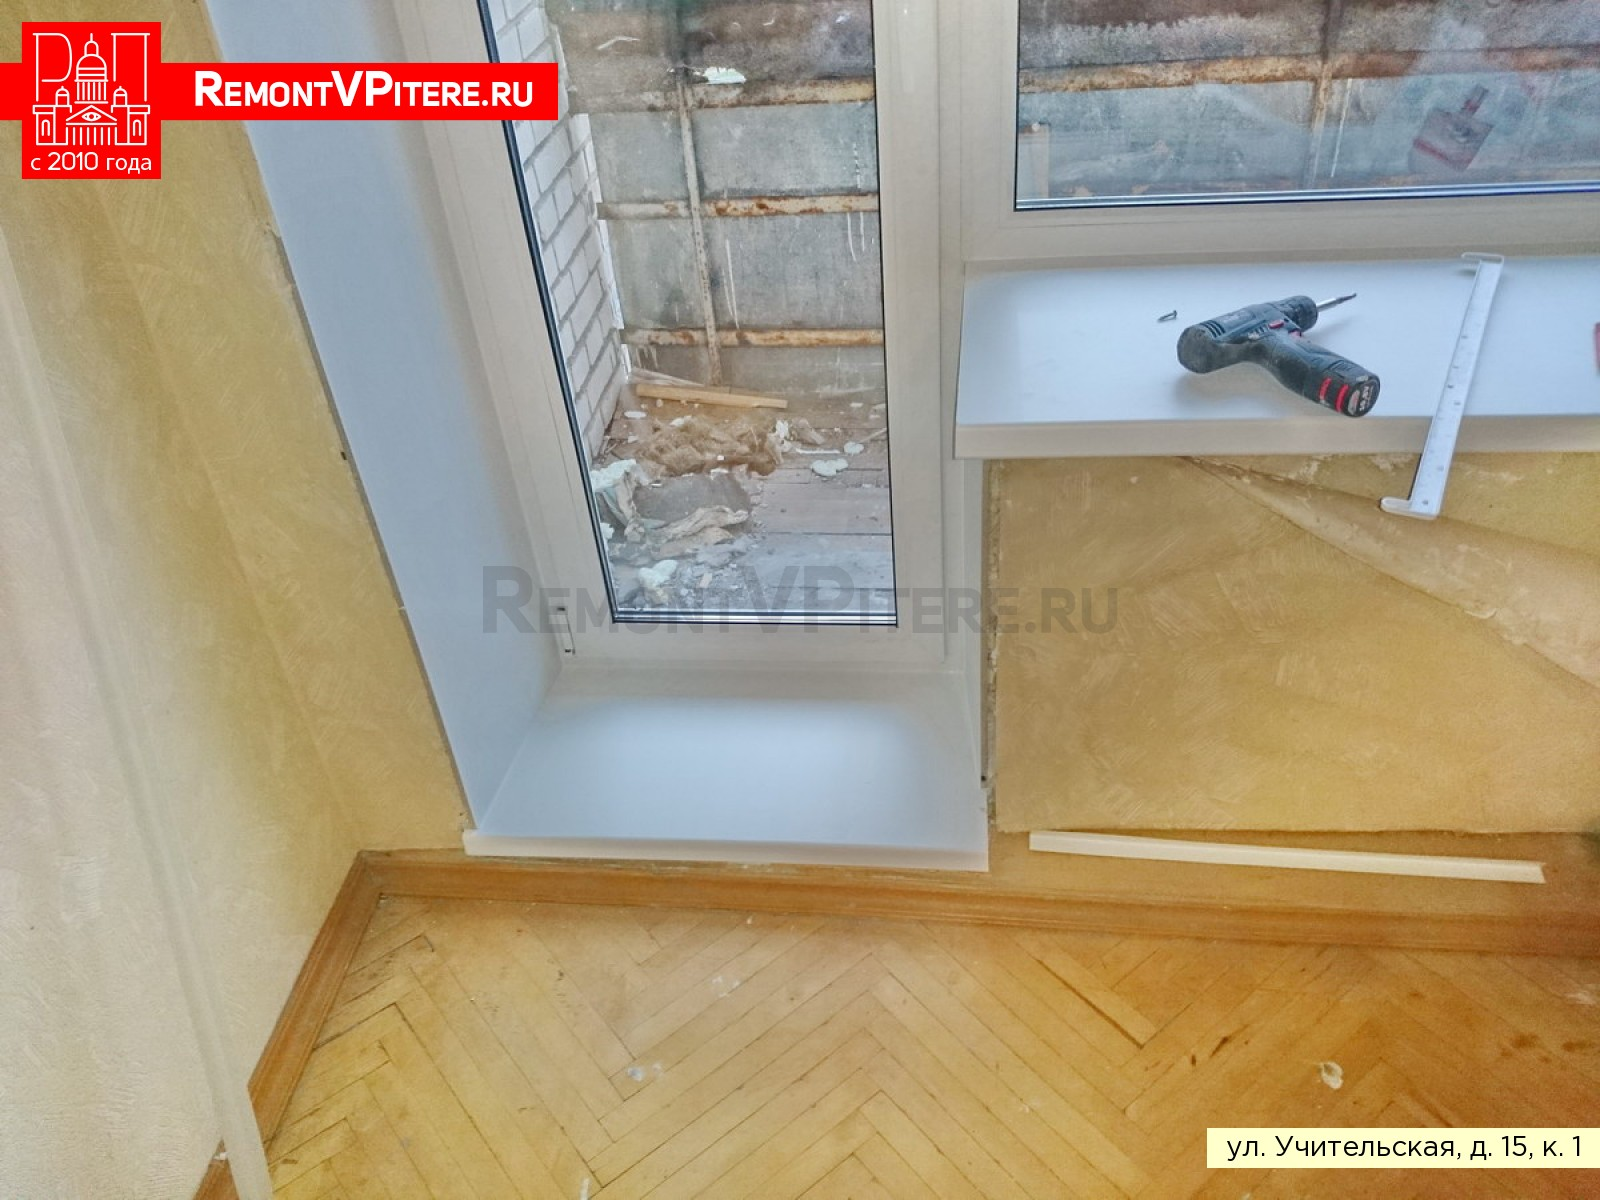 Порожек на балкон в доме 1-528КП-80